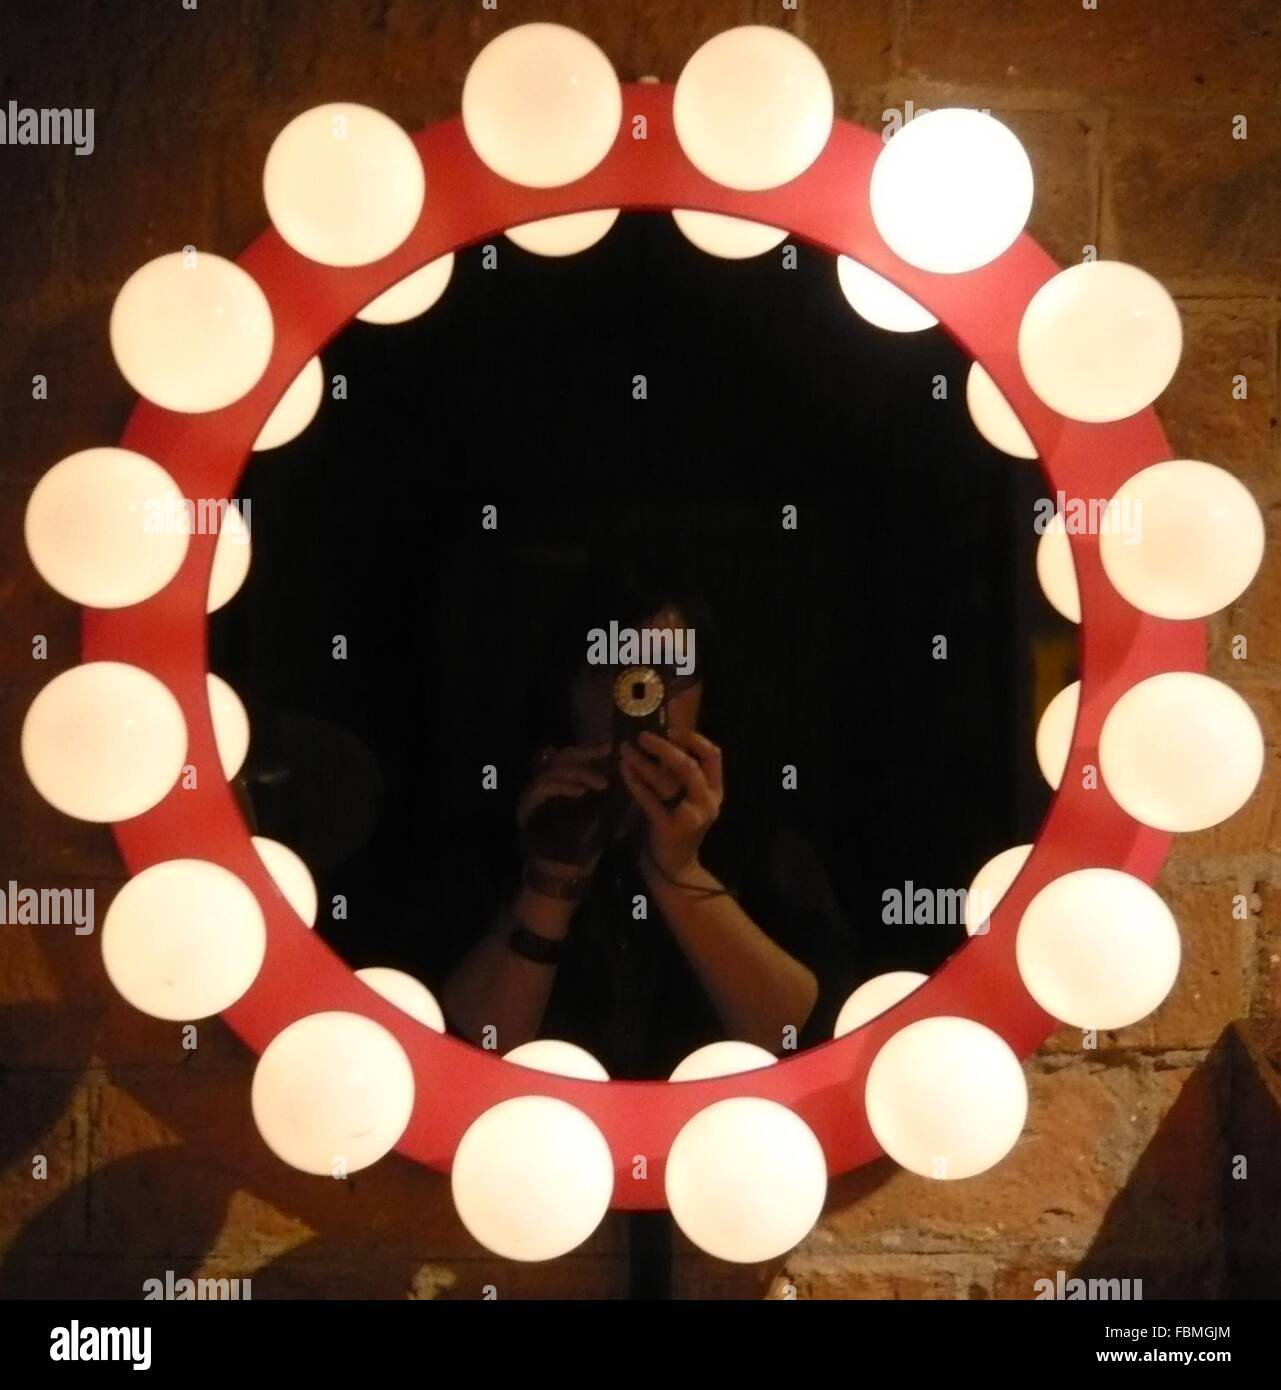 Woman Shooting Circular Illumination Device - Stock Image